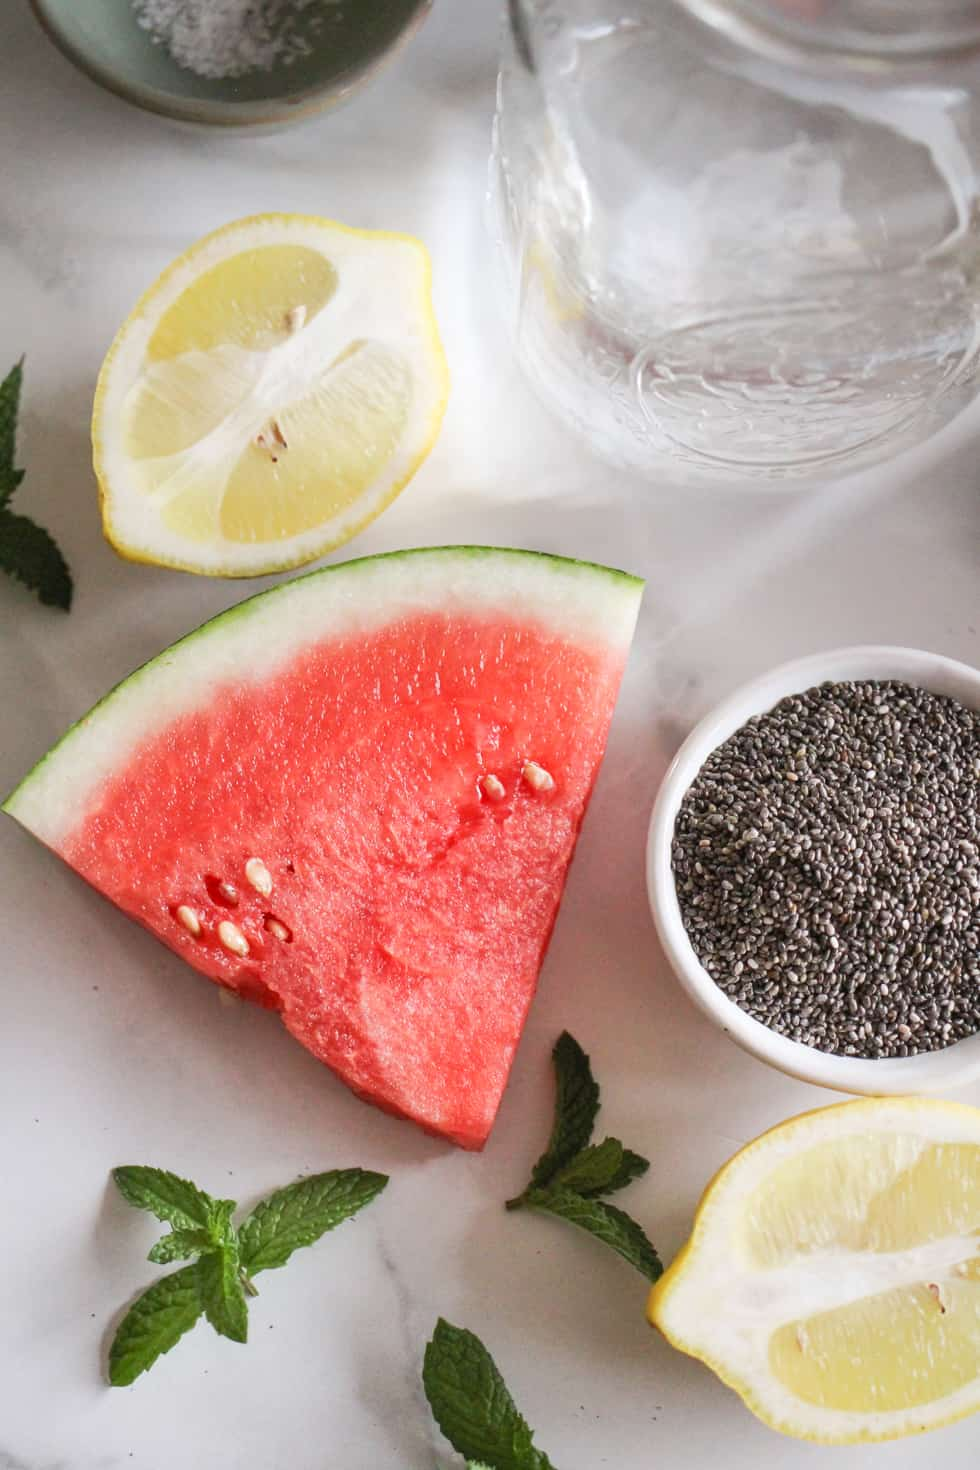 Sliced watermelon, lemon, chia seeds, fresh mint, and a jar of water.